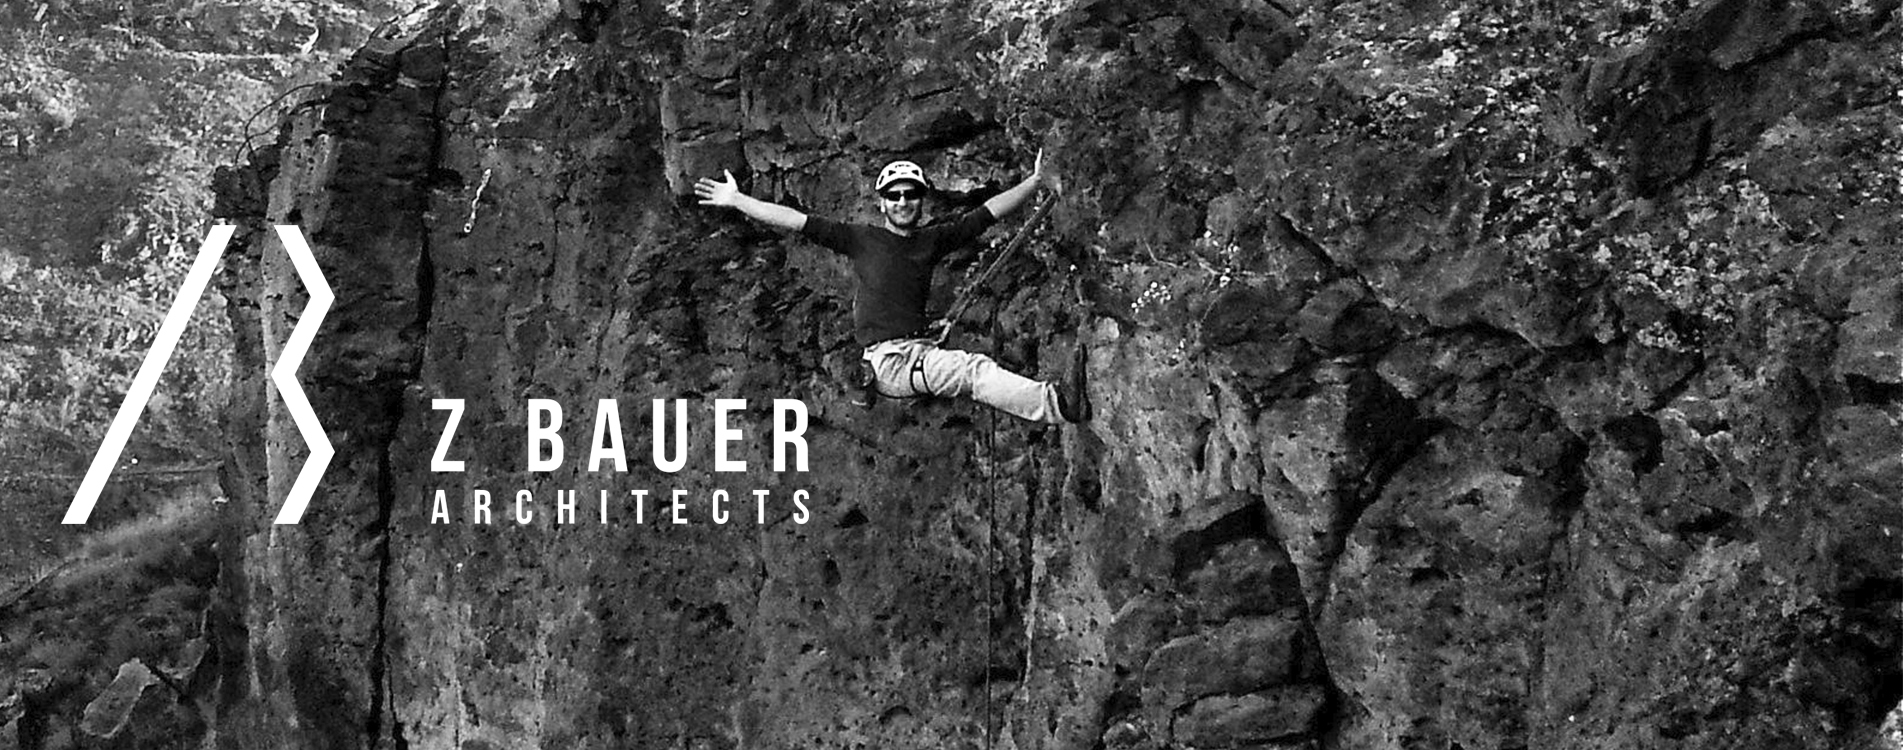 Zohrab Bauer Architect Philosophy Nature 22